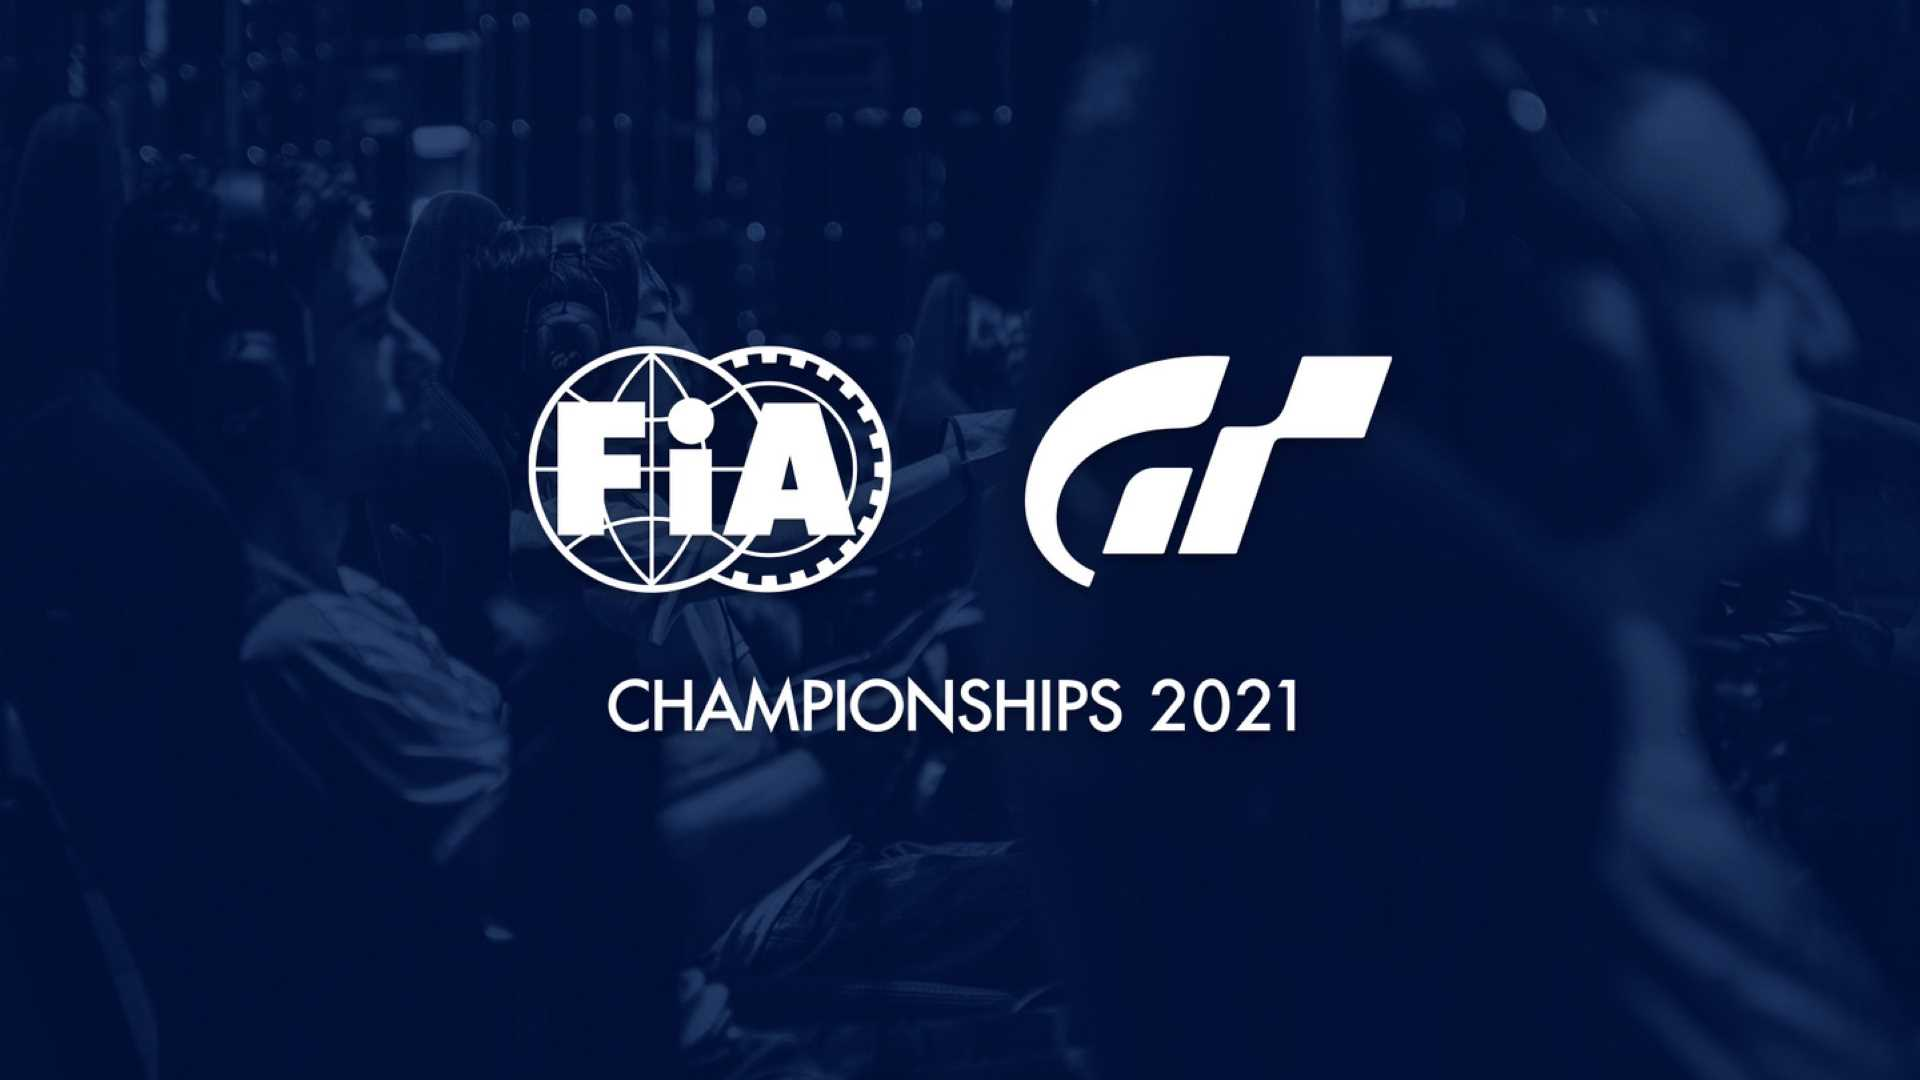 FIA Certified Gran Turismo Championships 2021 - Keyart